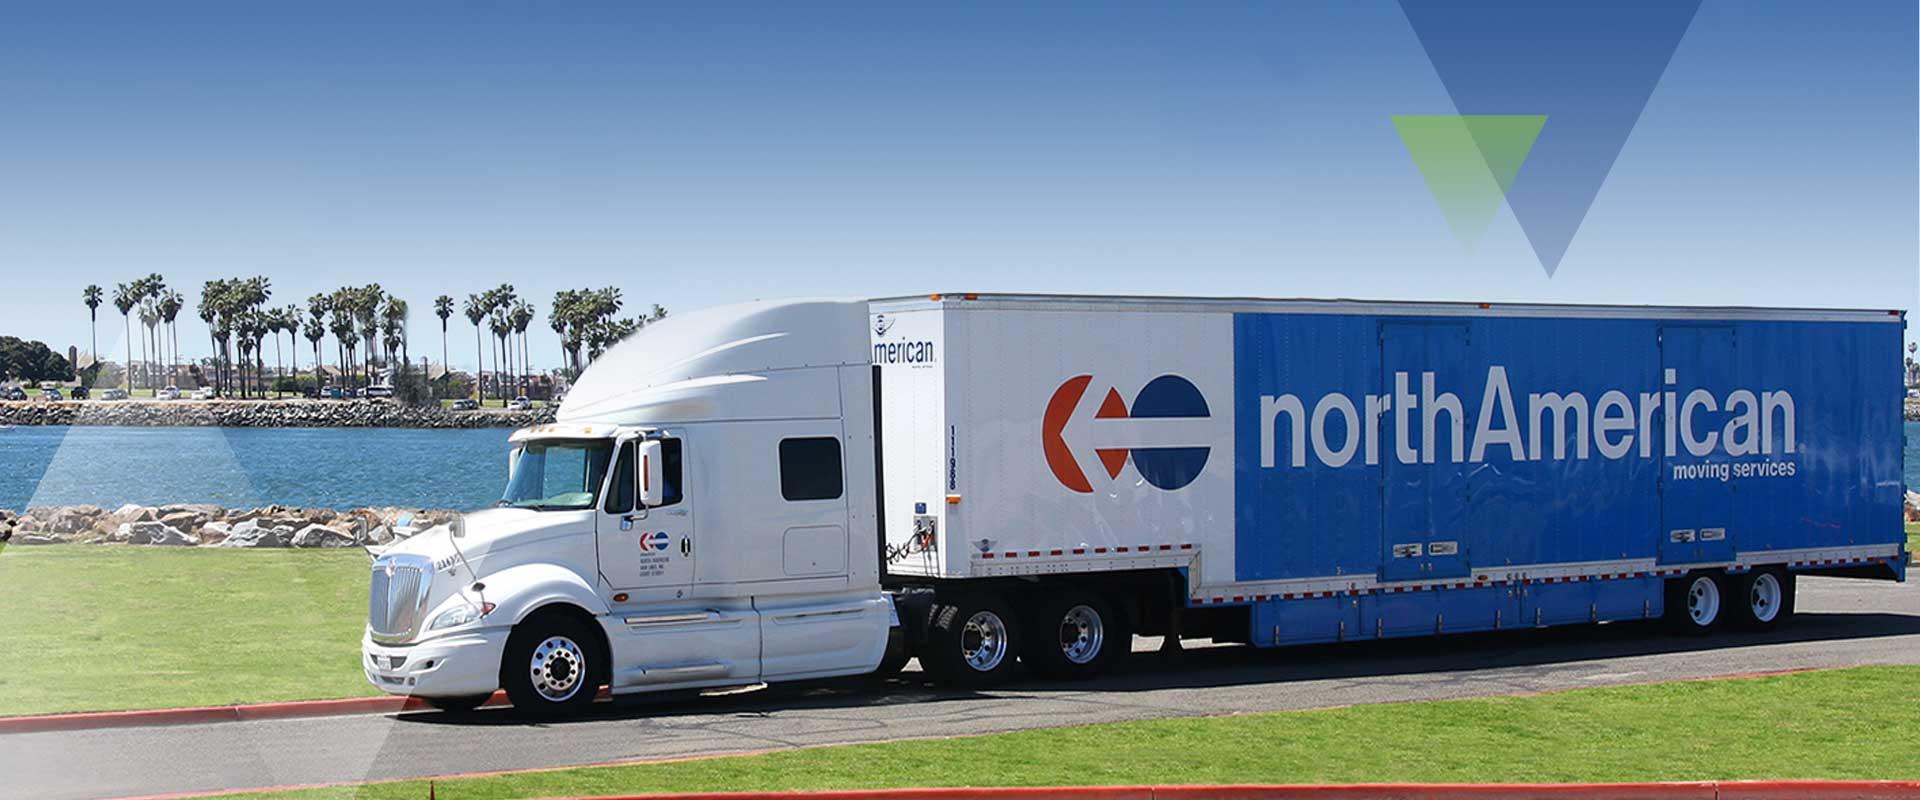 northAmerican Truck